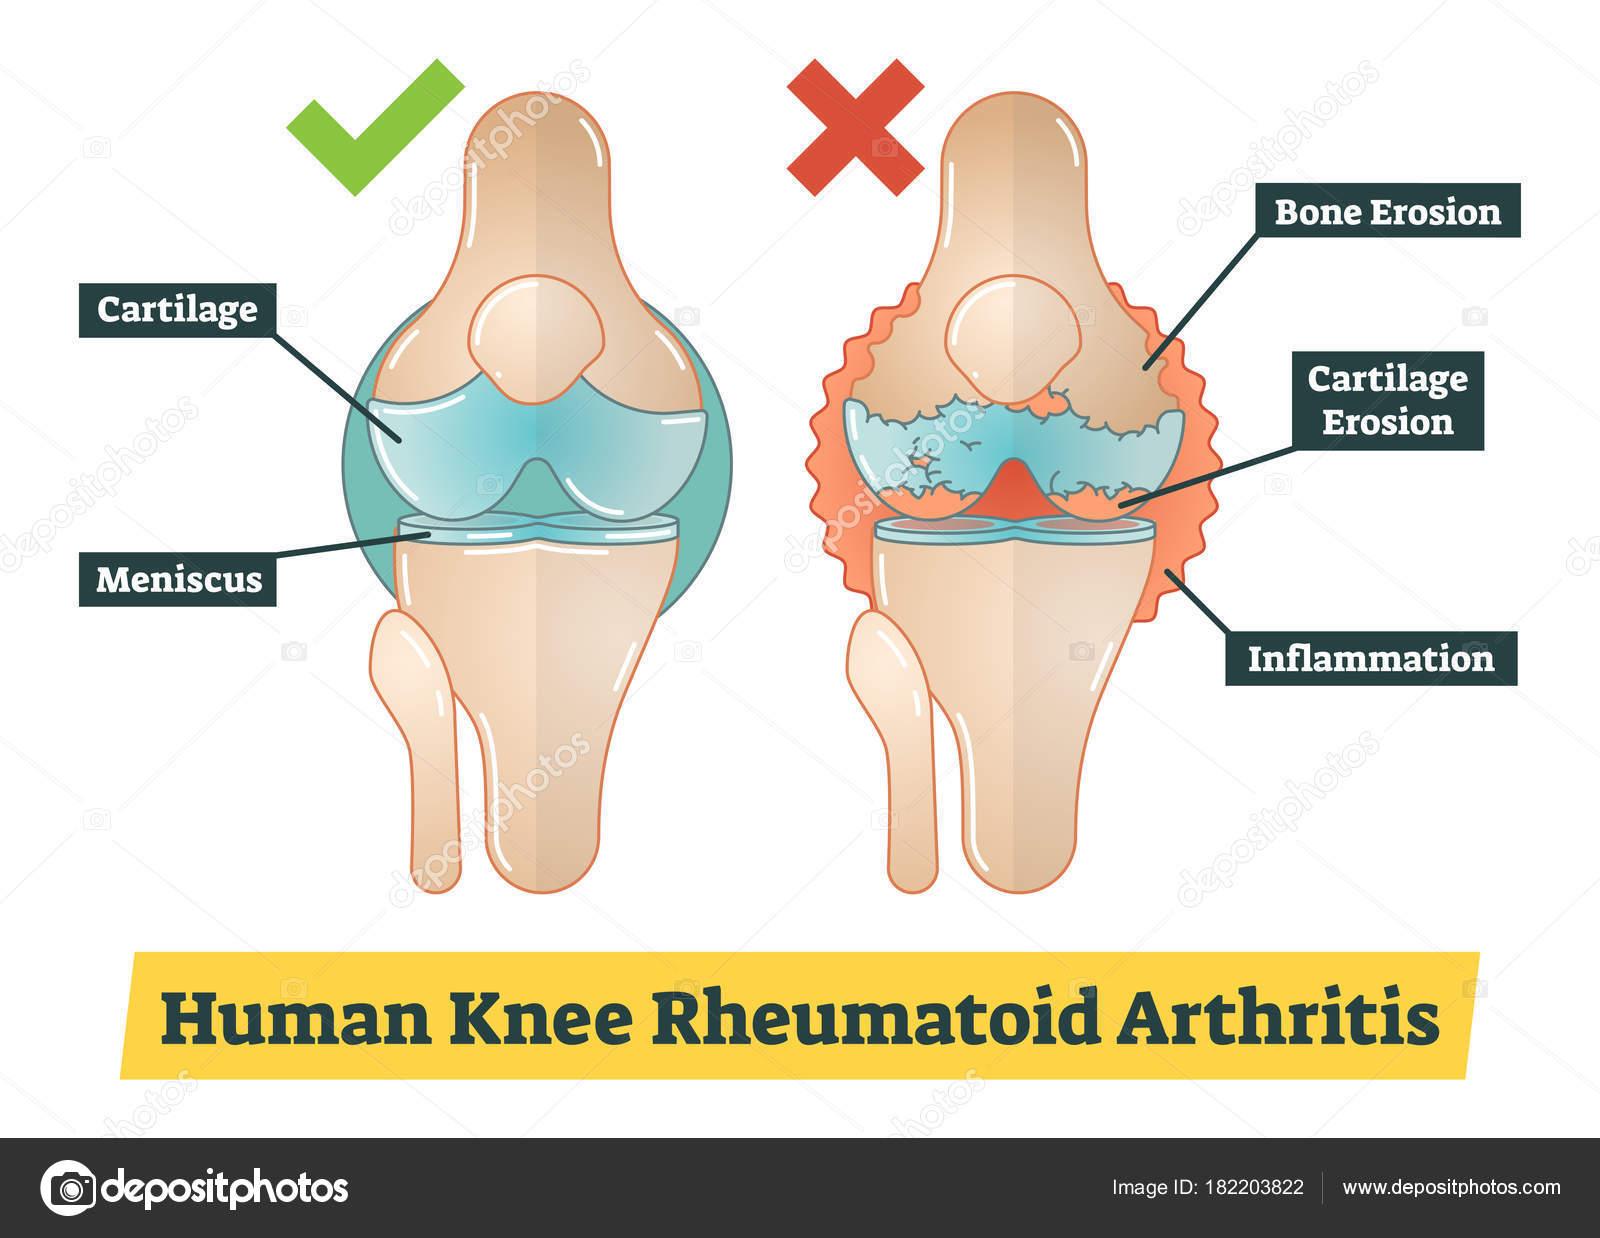 Human knee rheumatoid arthritis diagram illustration stock vector human knee rheumatoid arthritis diagram illustration stock vector ccuart Image collections